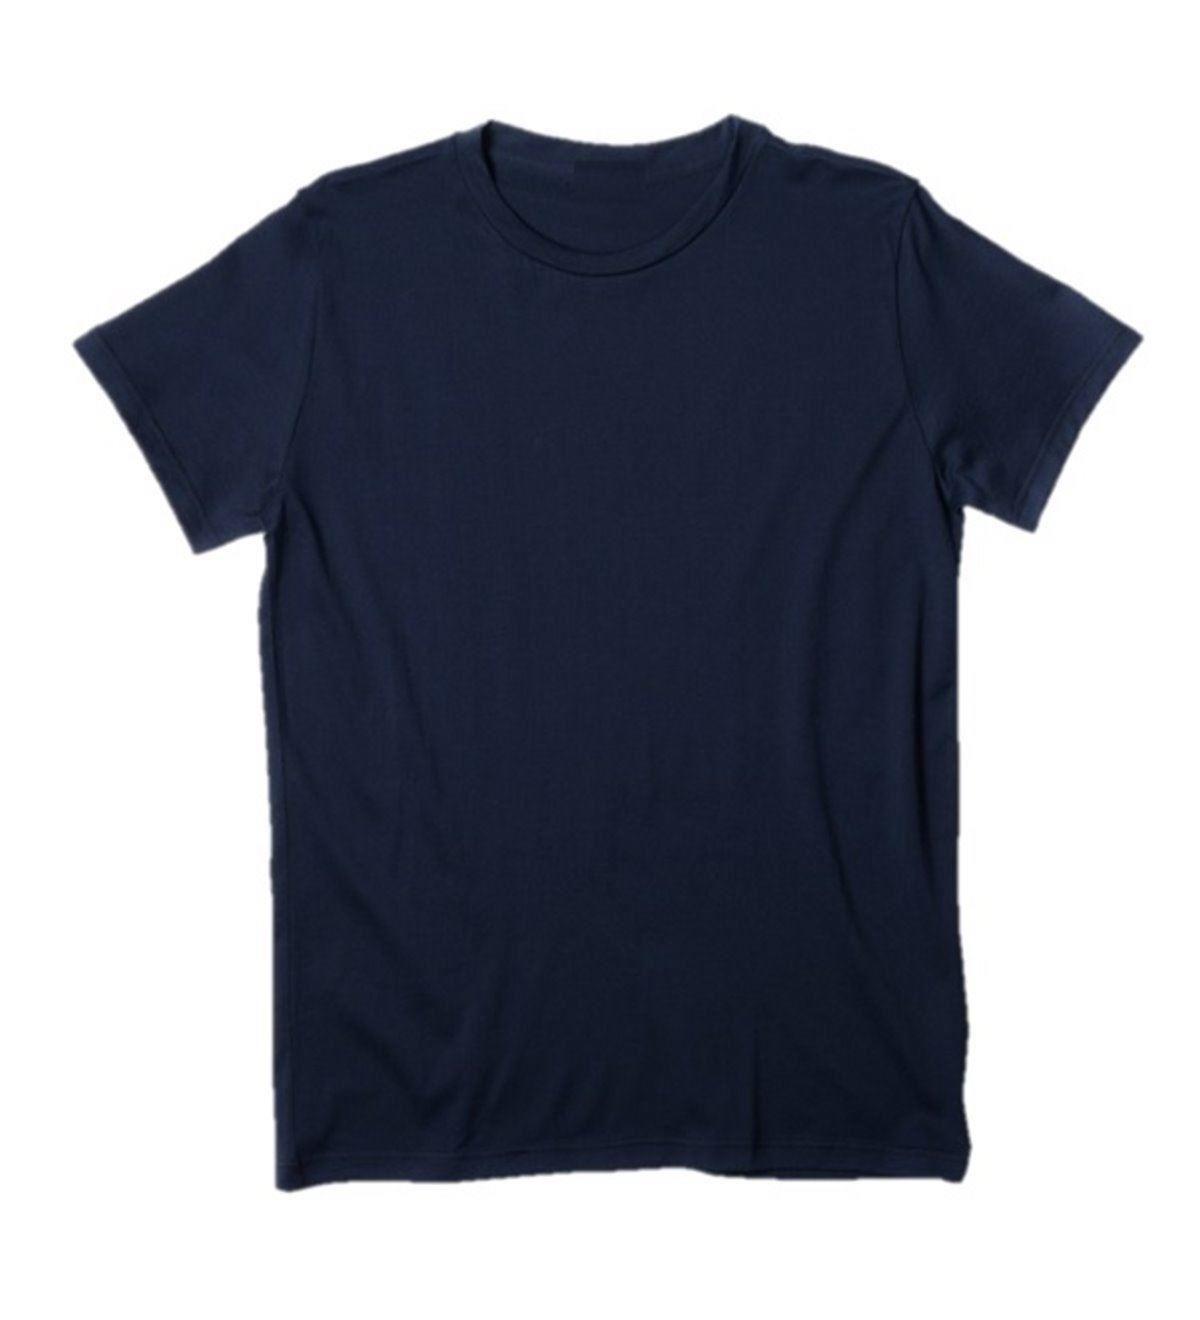 Big mens t shirt tee polo king size 3xl 4xl 5xl 6xl twin pack for Mens t shirts 4xl